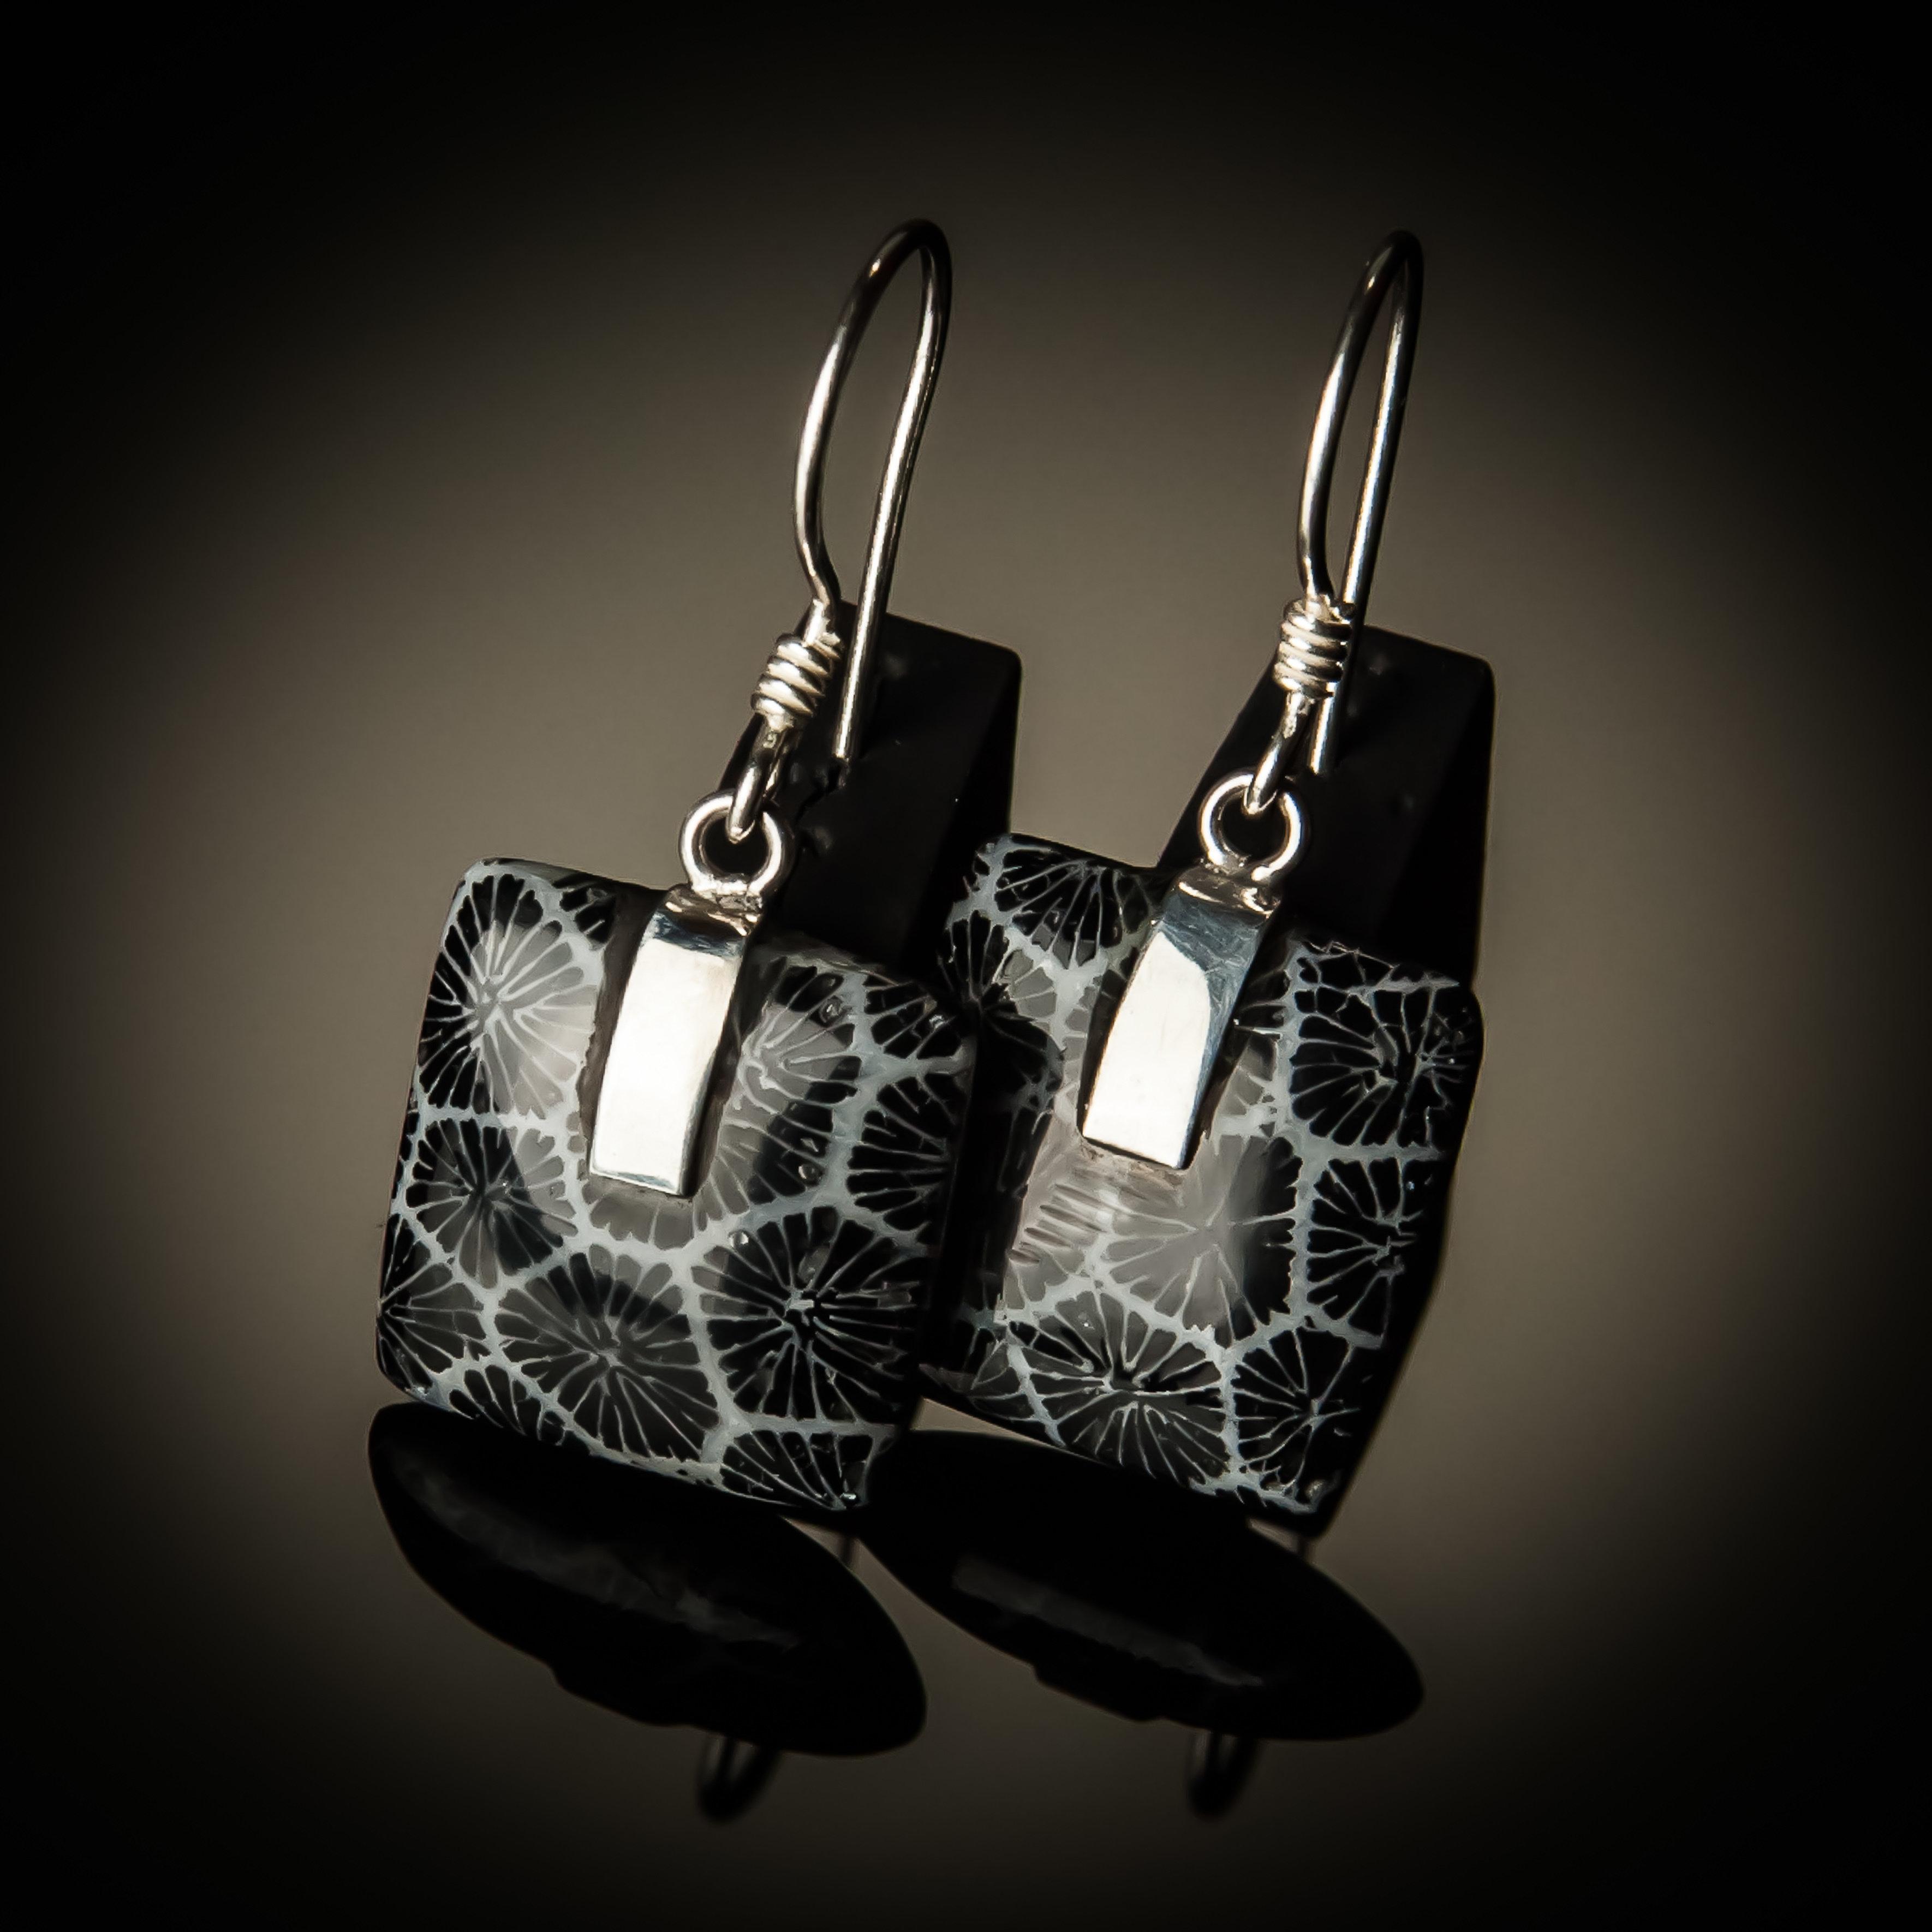 Black Coral Square Sterling Silver Earrings ER-PKC-07Lg-Black coral